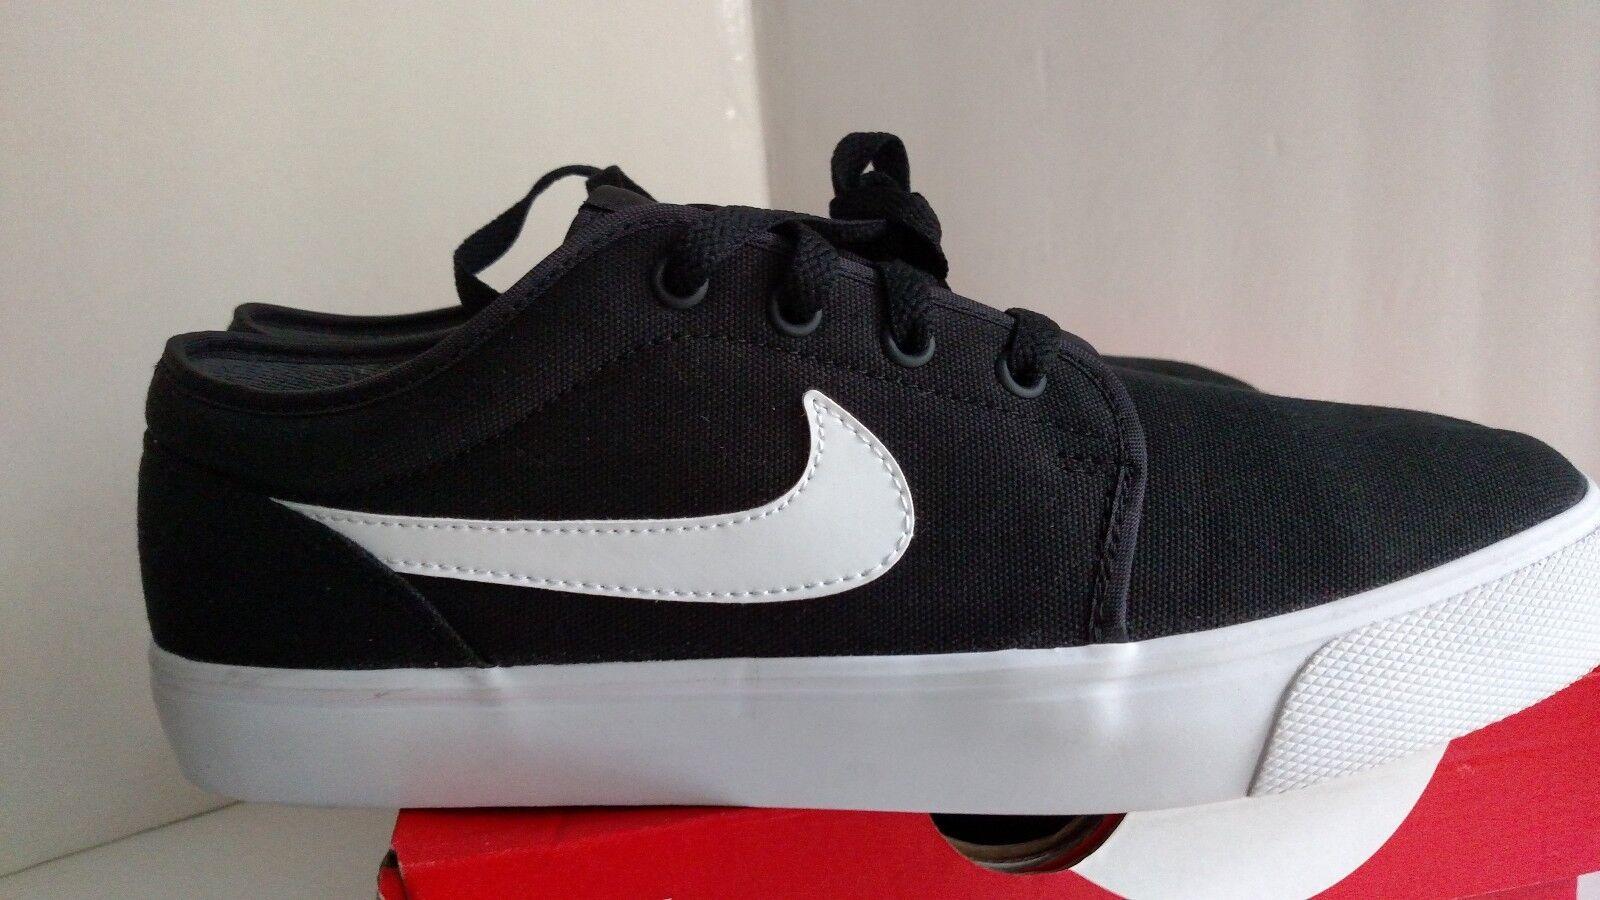 Nike Toki Low TXT textile black white 555272-020 Mens US size 9.5 Seasonal clearance sale